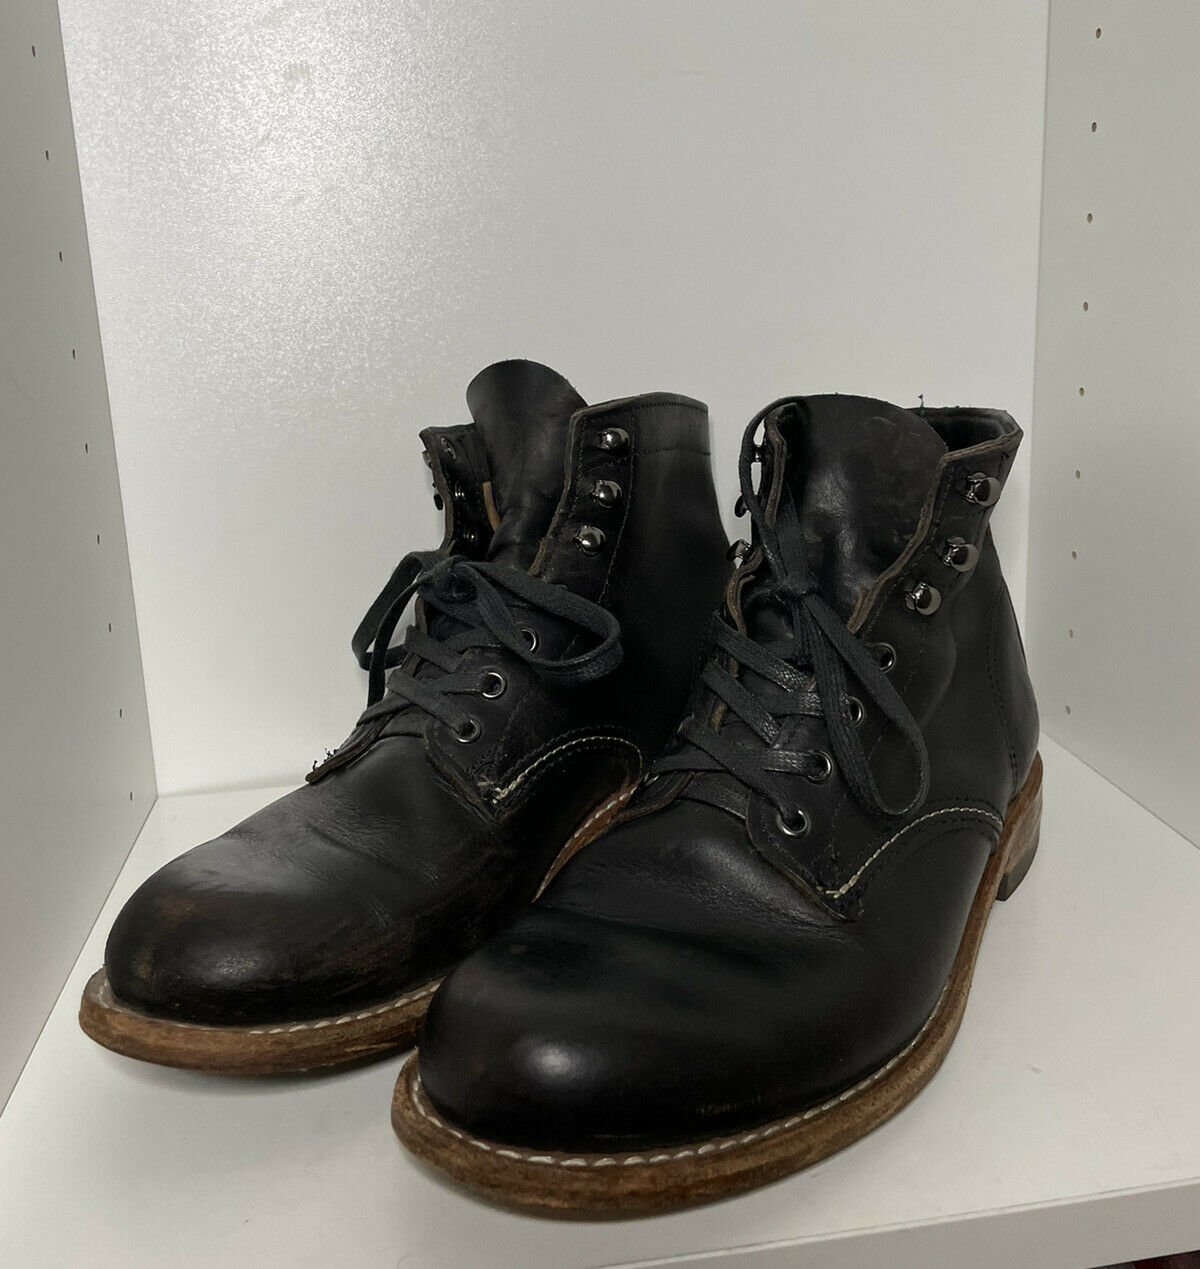 Wolverine 1000 Mile Boots - Size 7 - Black